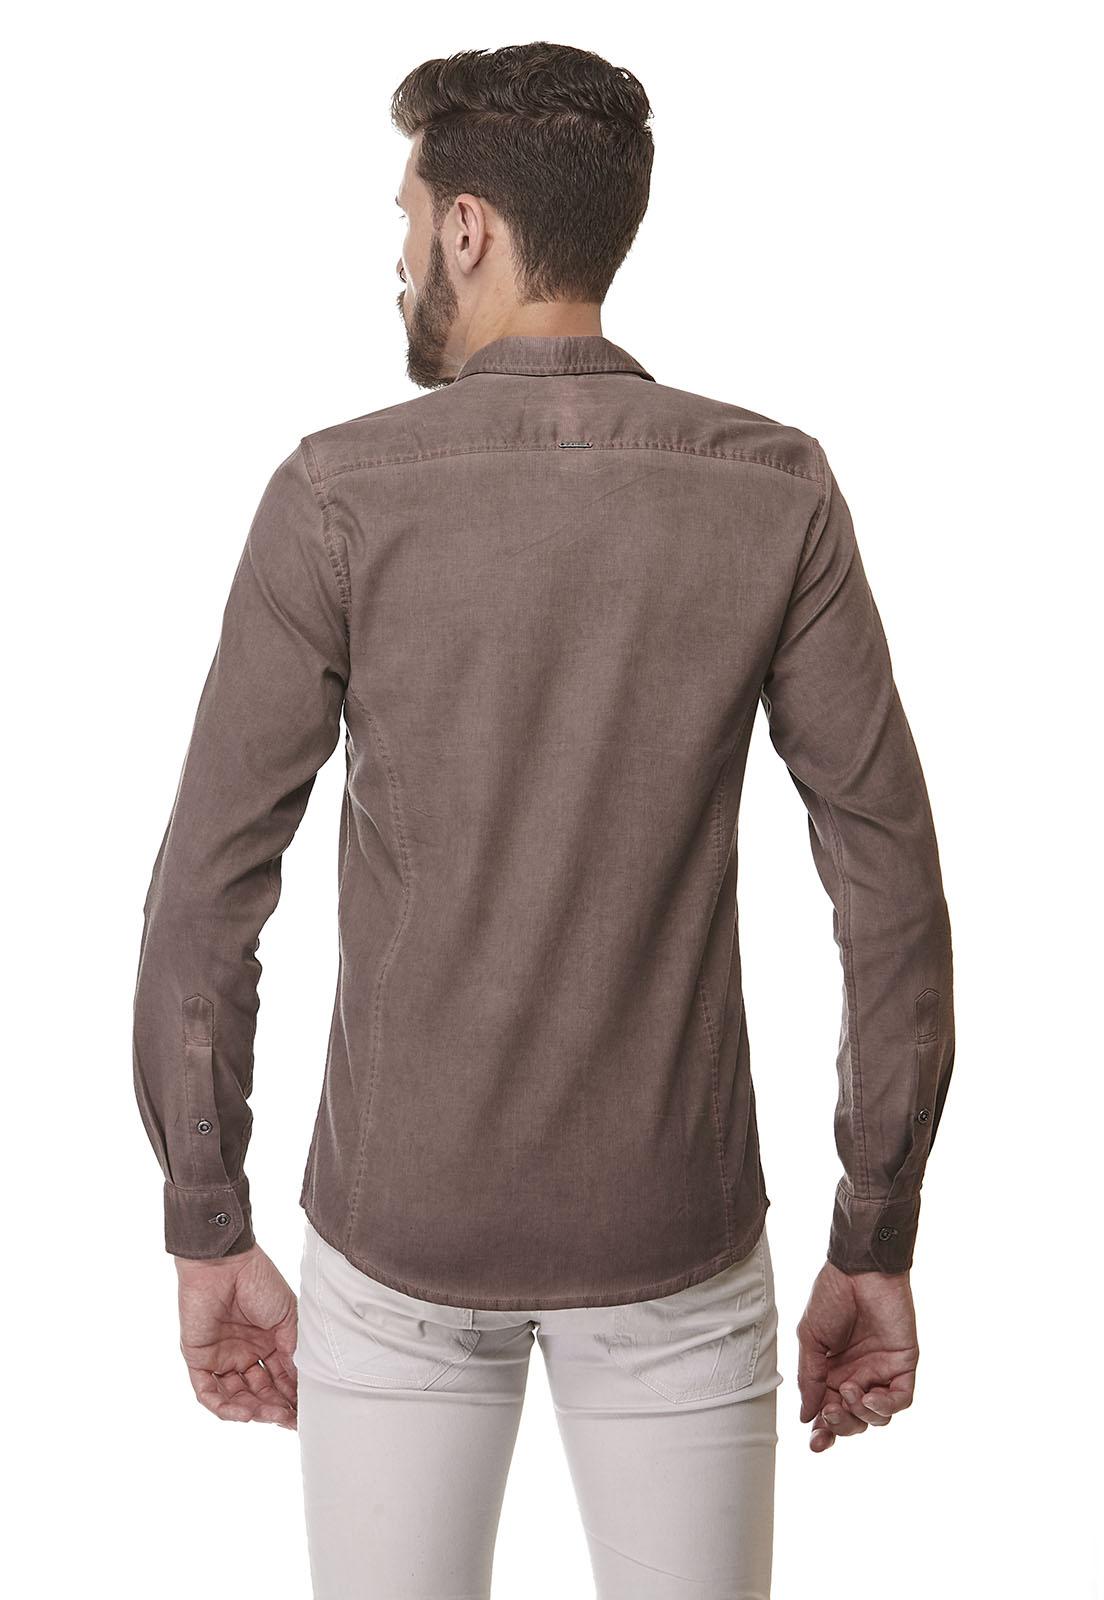 Camisa Fit Zaiko Tingimento Manga Longa 1916